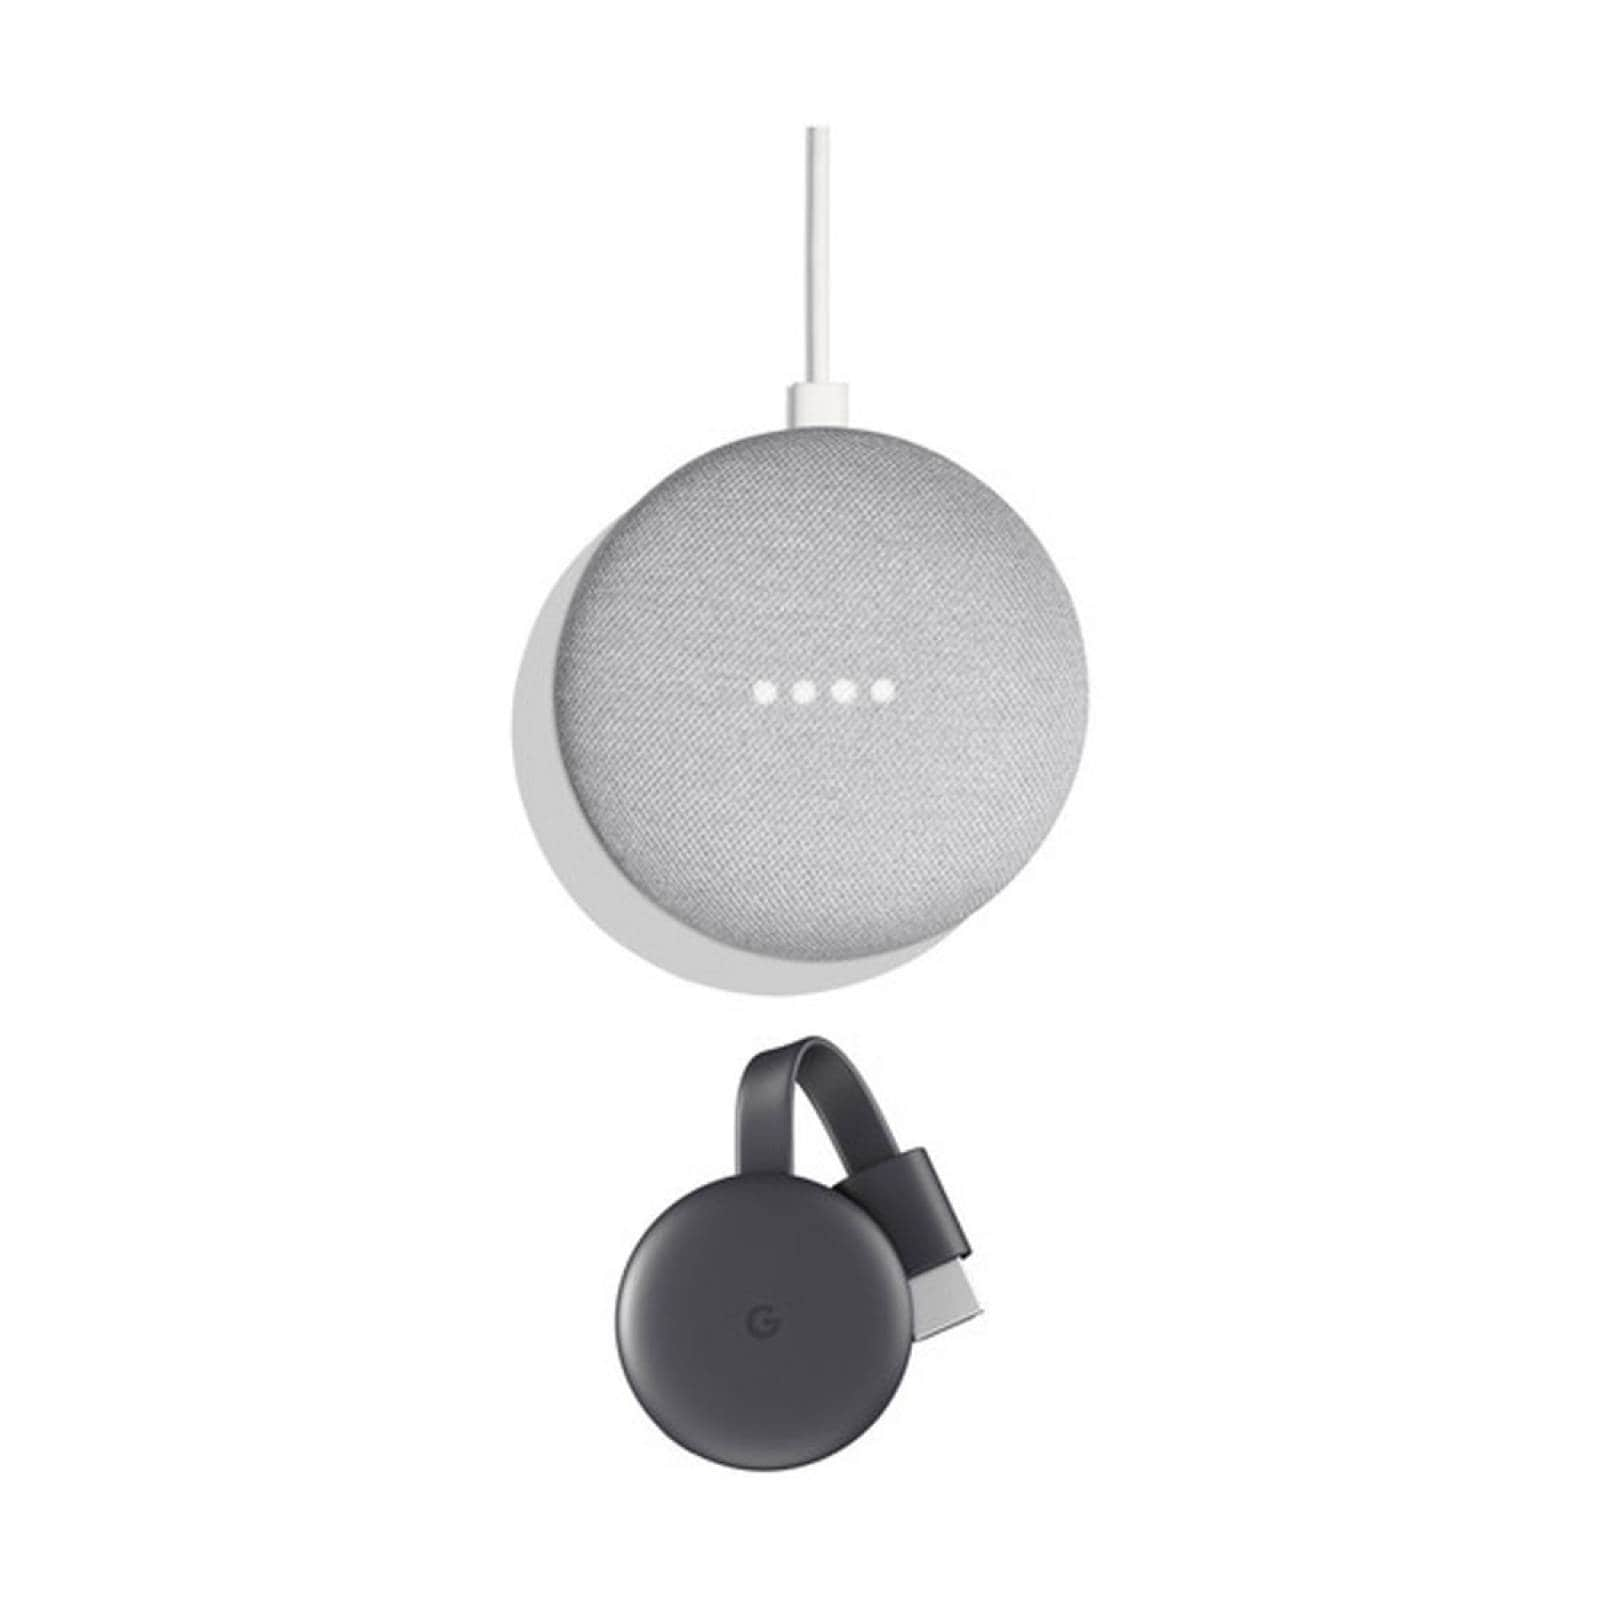 Set Google Chromecast 3era Generación & Google Home Mini